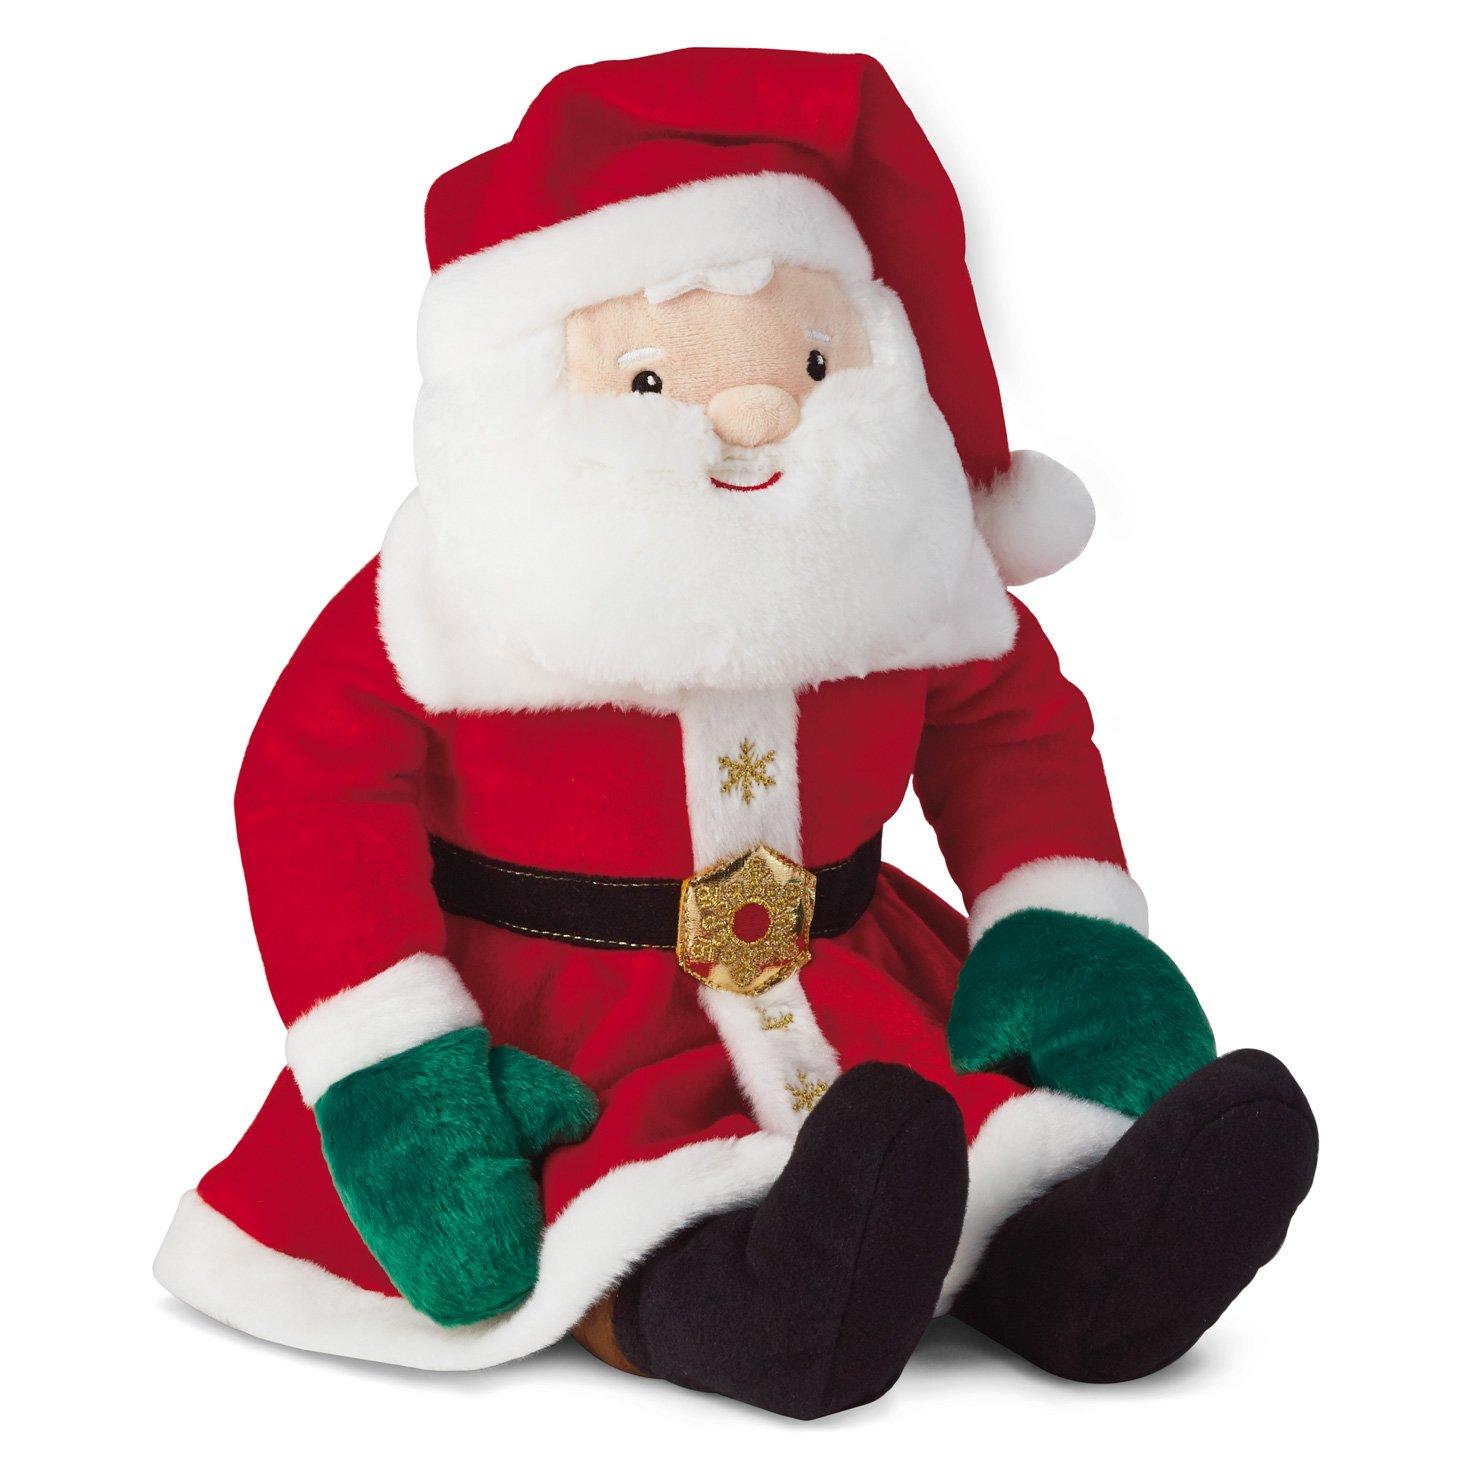 amazoncom hallmark north pole santa claus plush stuffed toy home kitchen - Stuffed Santa Claus